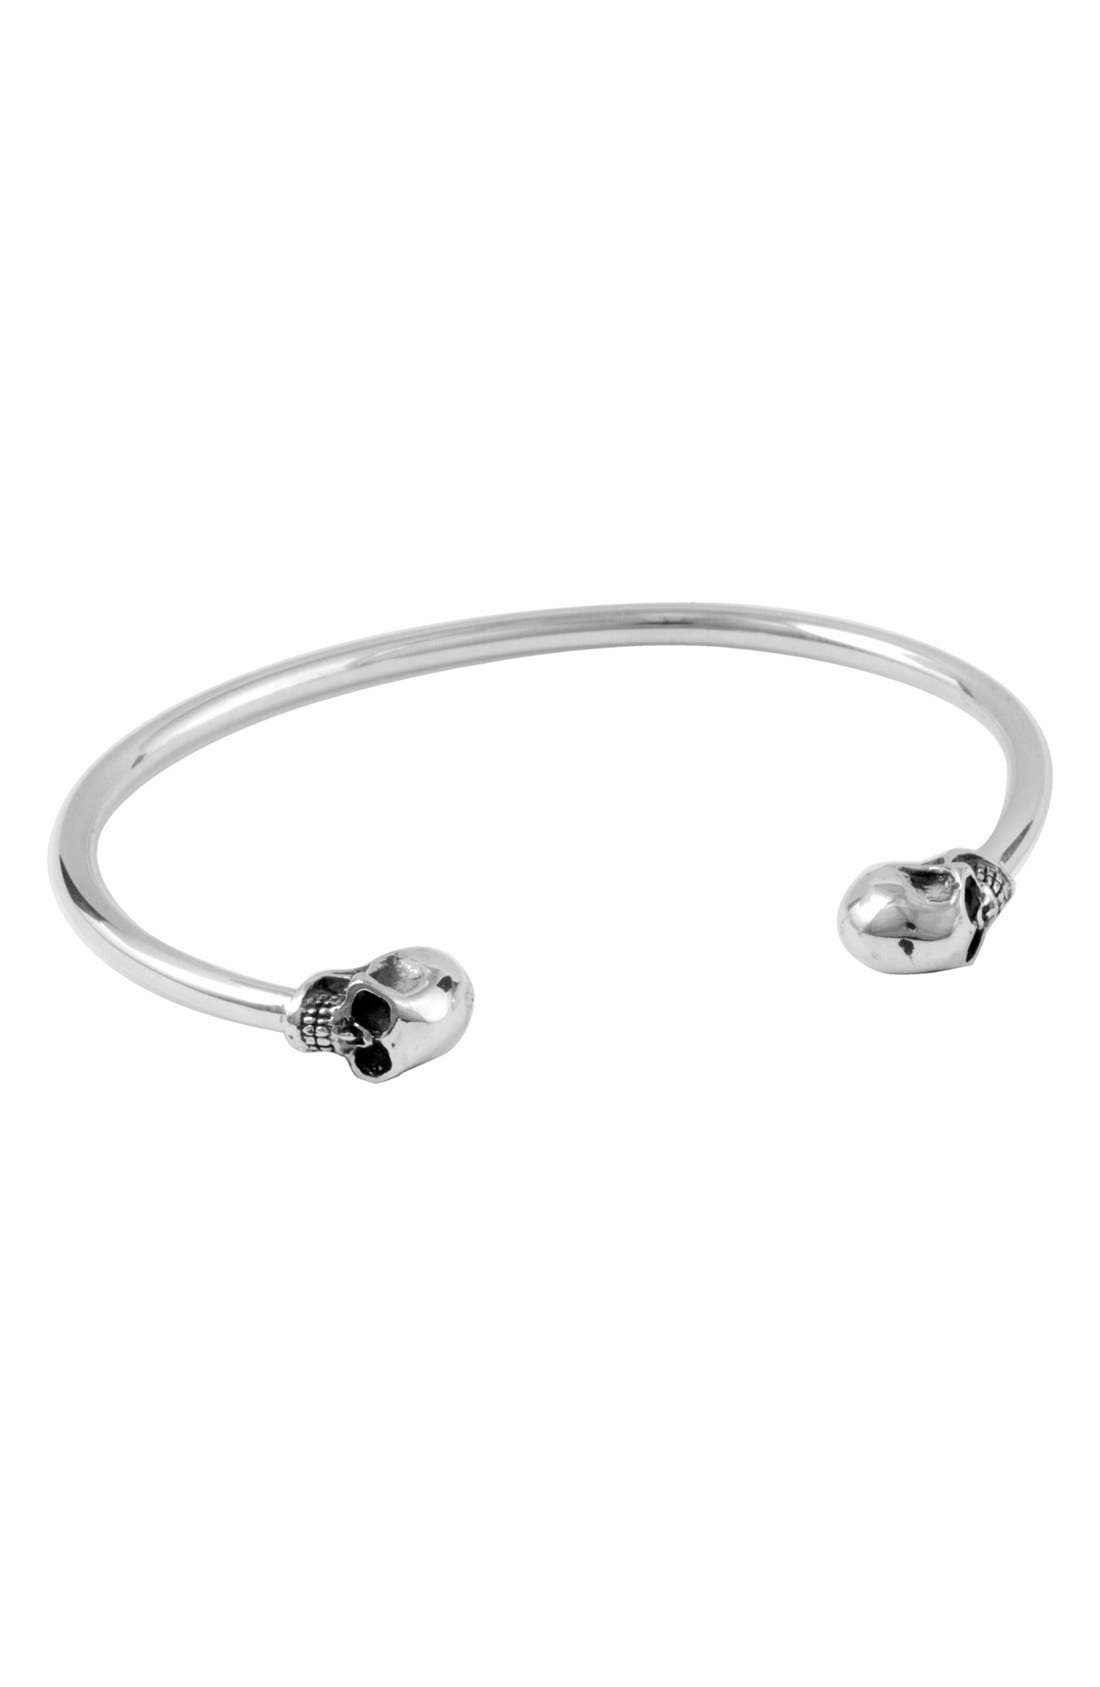 King Baby Sterling Silver Cuff Bracelet